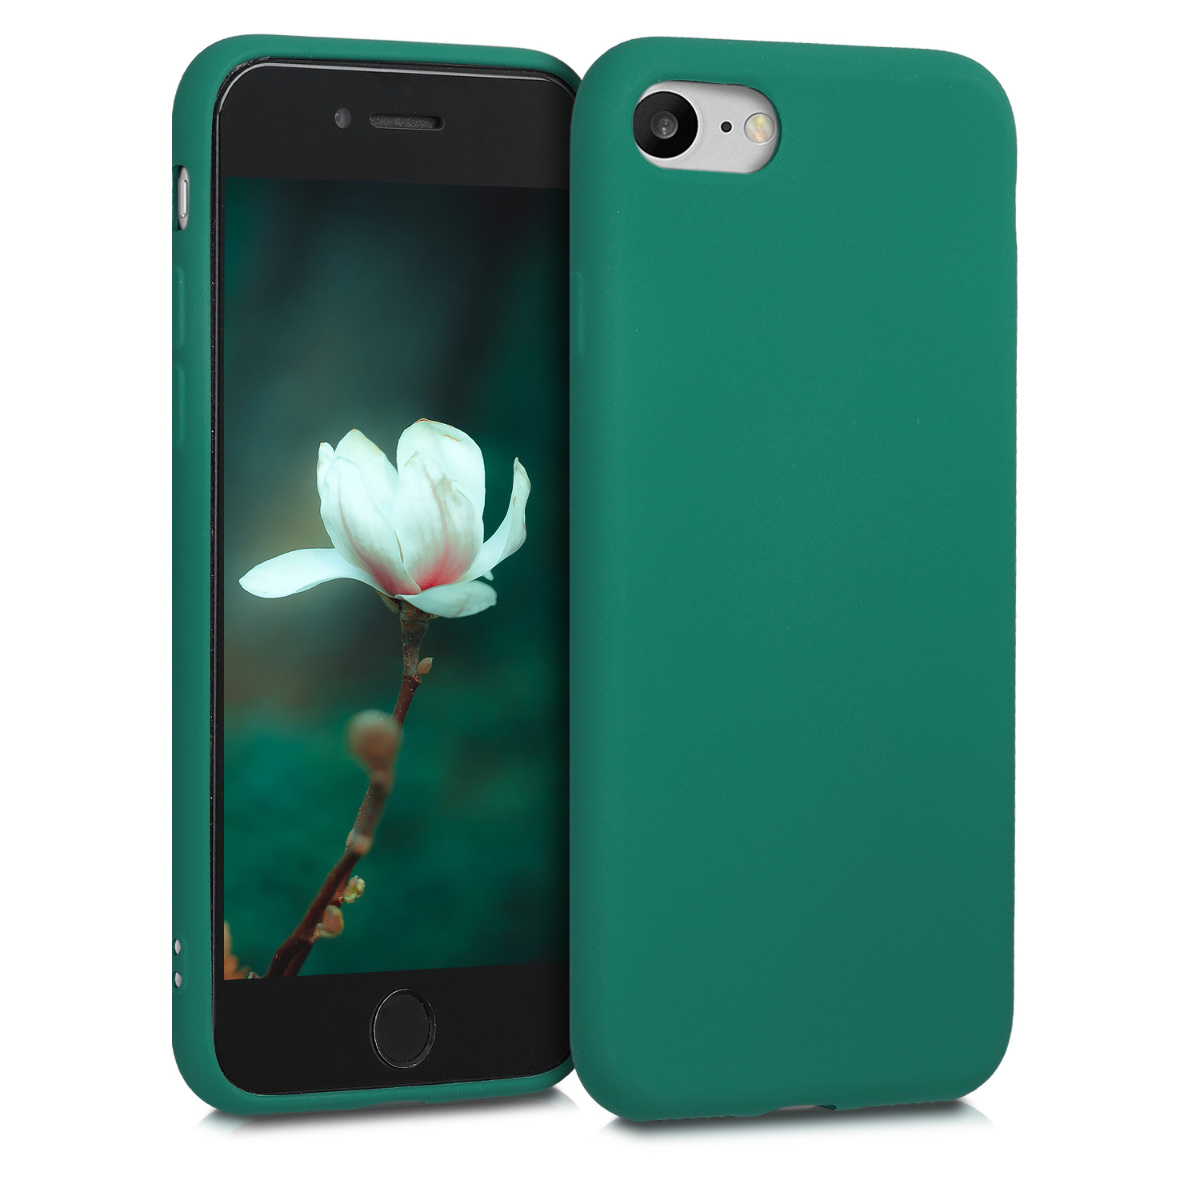 KW Θήκη Σιλικόνης Apple iPhone 7 / 8 - Dark Metallic Green (40350.170)